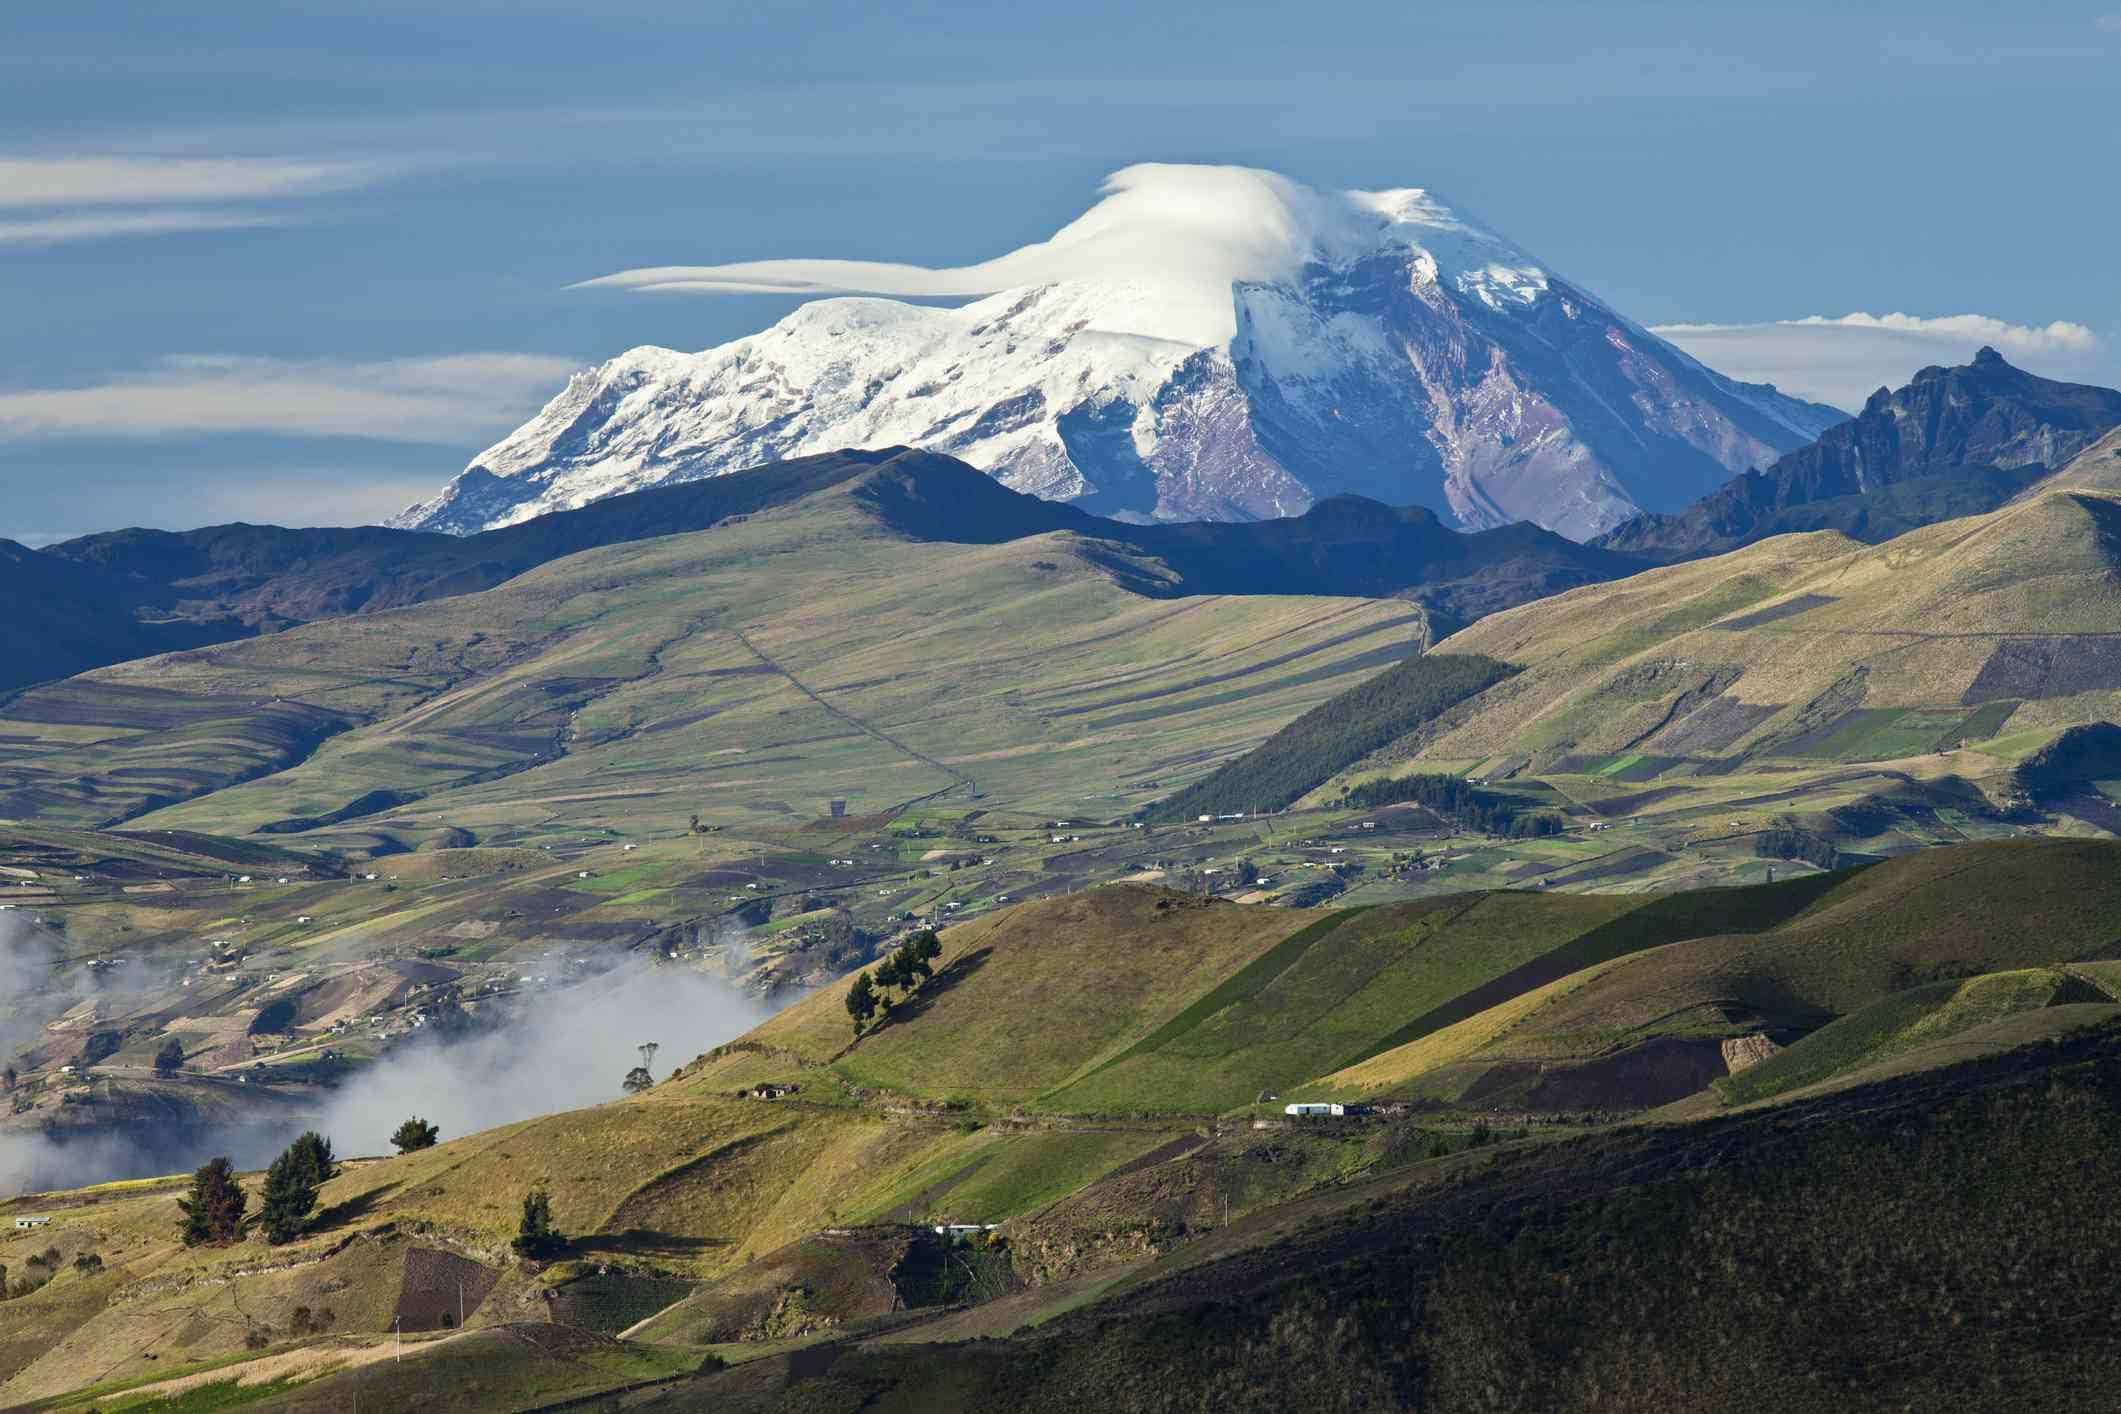 Patchwork of fields in front of Chimborazo Volcano across Valley Latacunga, Ecuador